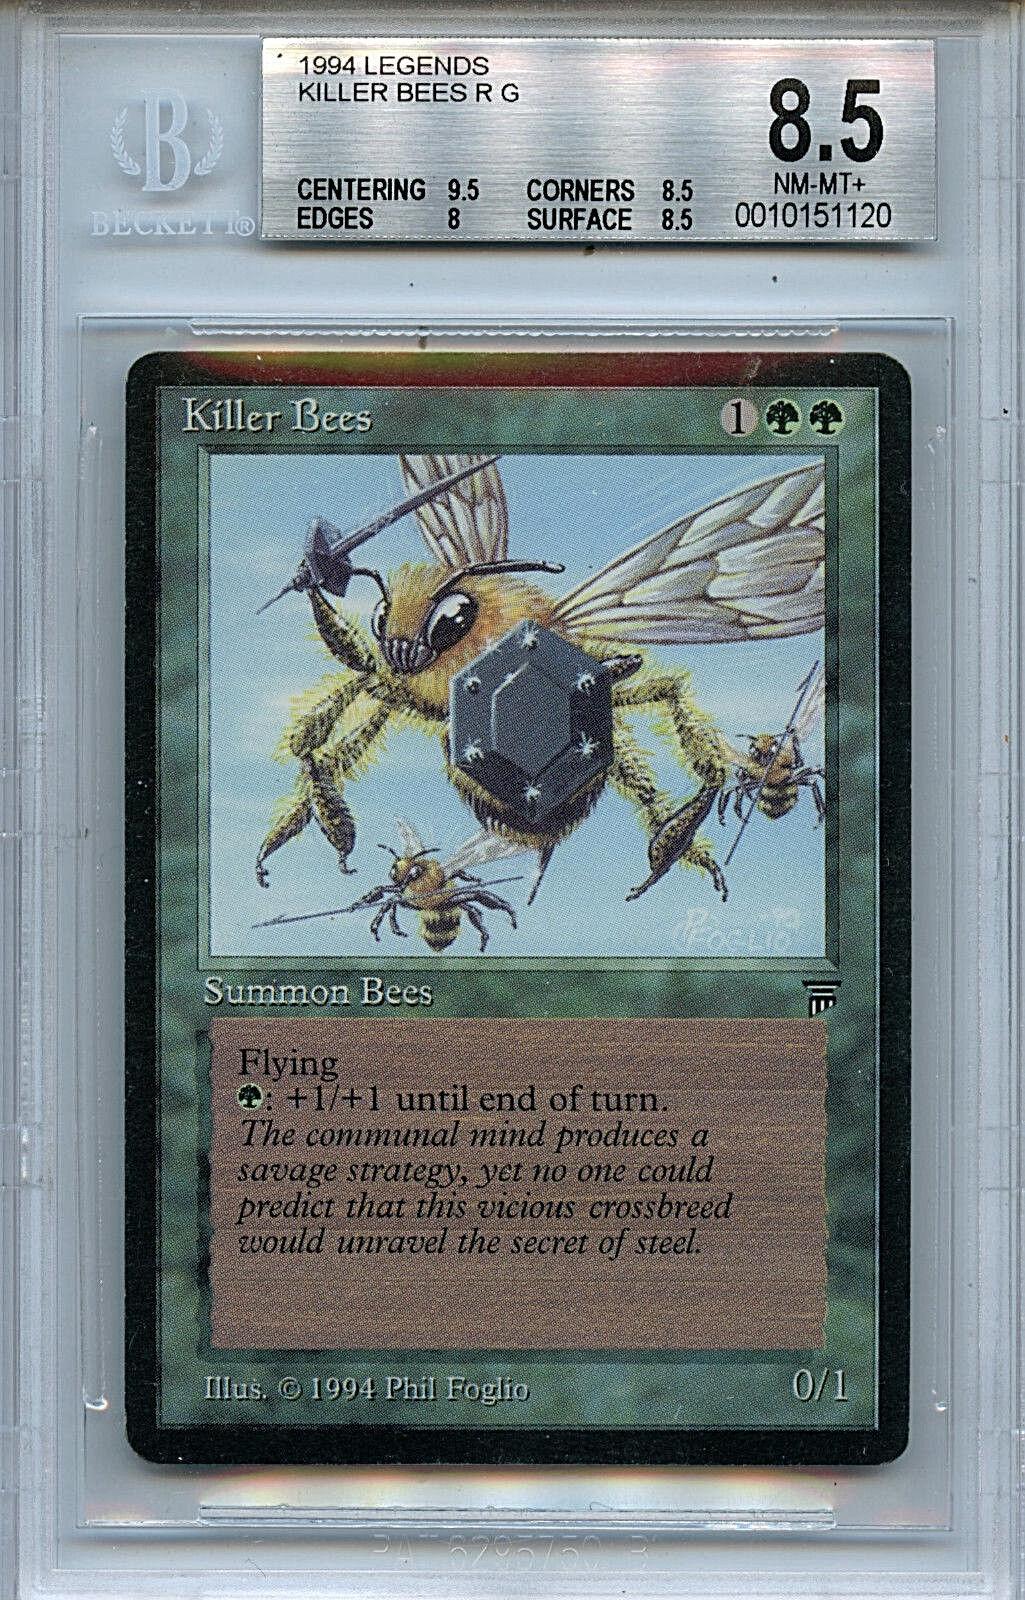 MTG Legends Killer Bees BGS 8.5 NM-MT+ card Magic the Gathering WOTC 1120